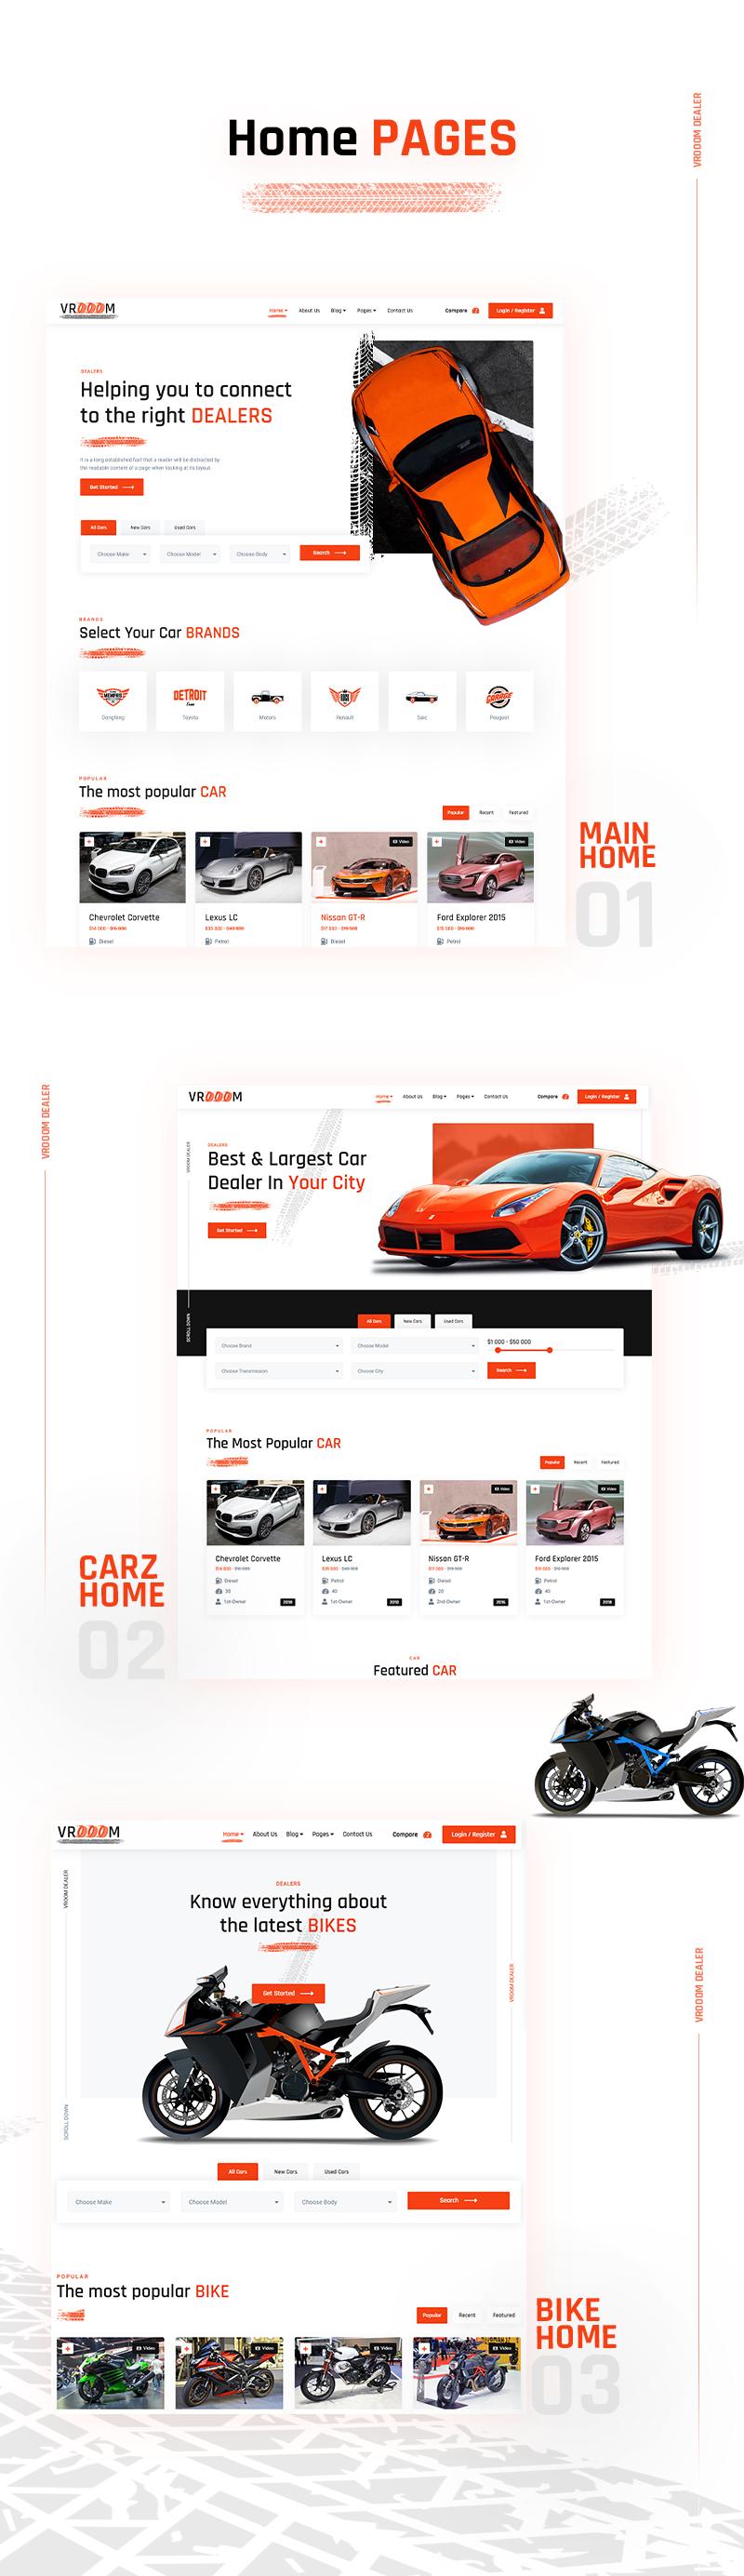 Vrooom - Auto Dealer WordPress Theme - 7 auto dealer wordpress theme Vrooom 02